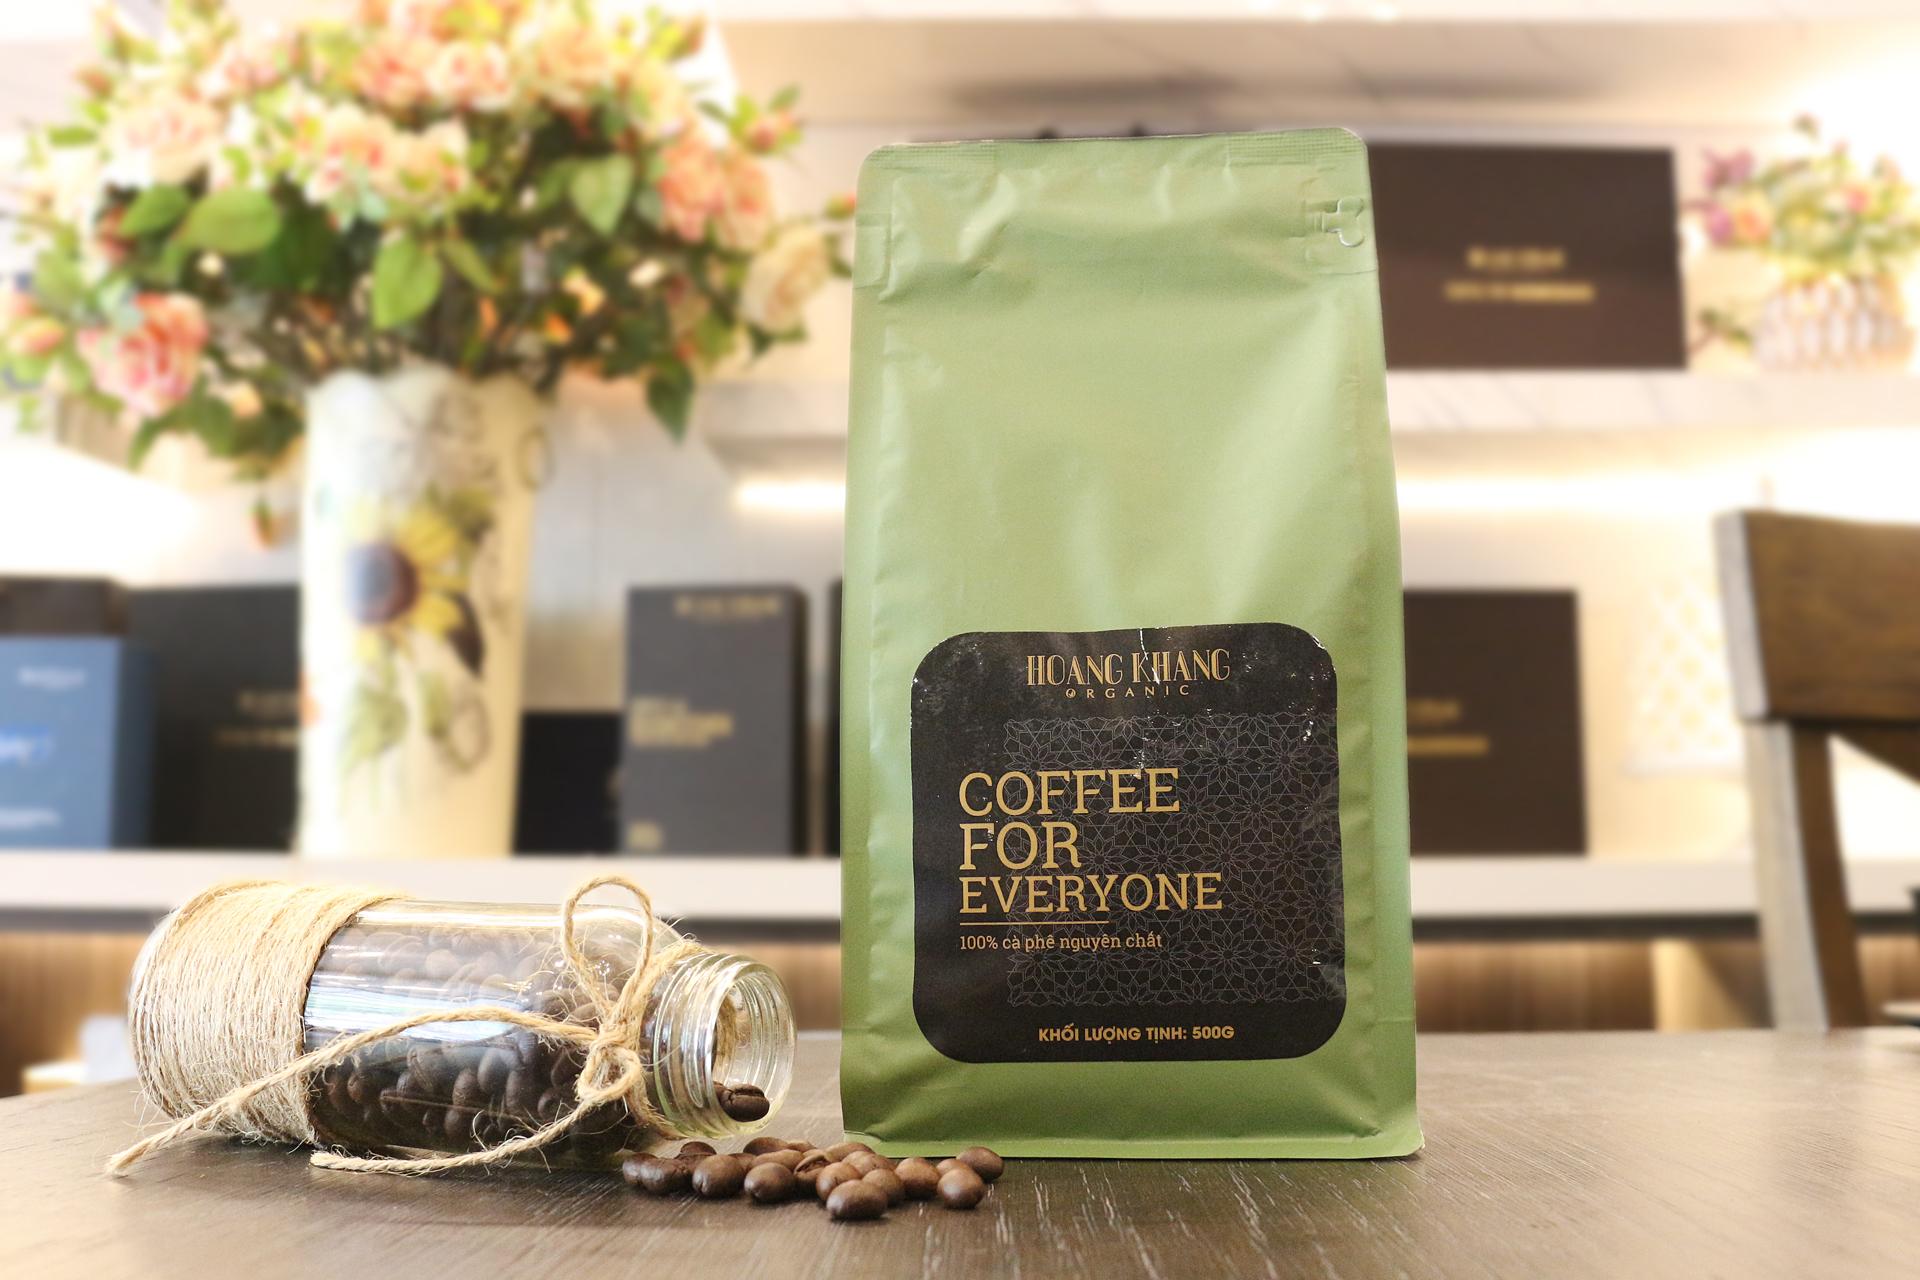 Coffee for Everyone